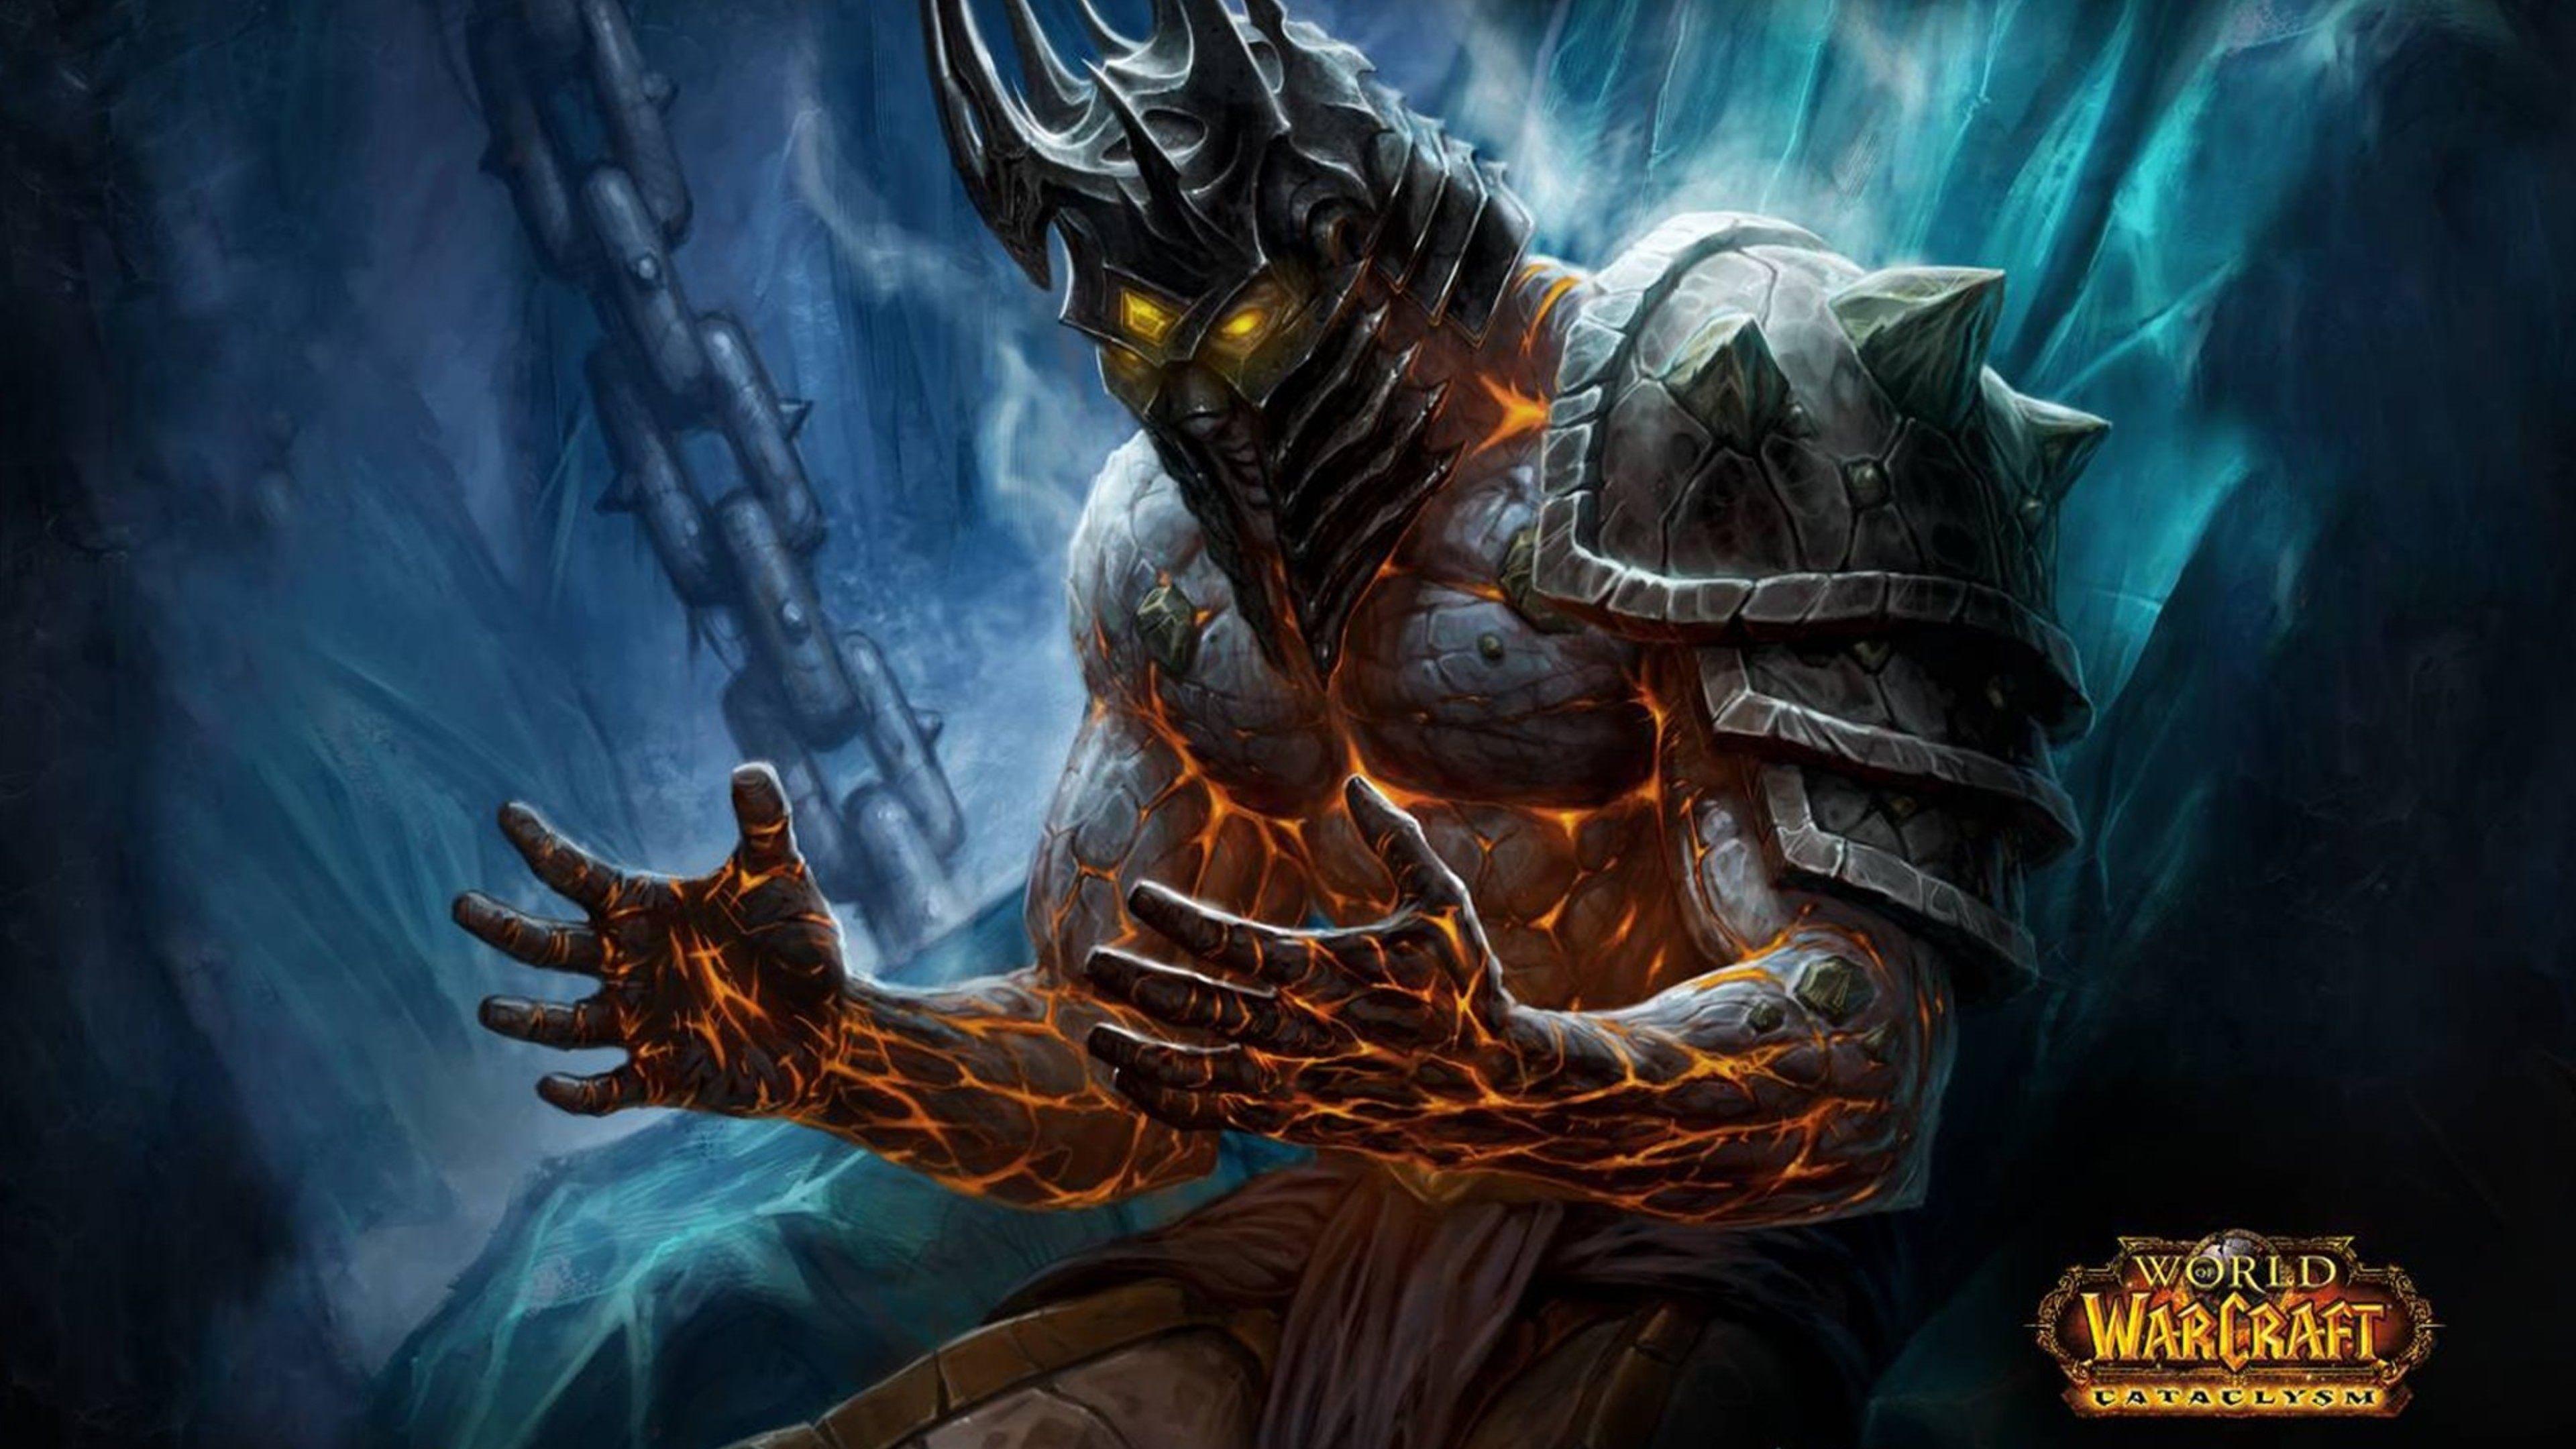 The Lich King World Of Warcraft Wallpaper Ultra HD 4K Resolution